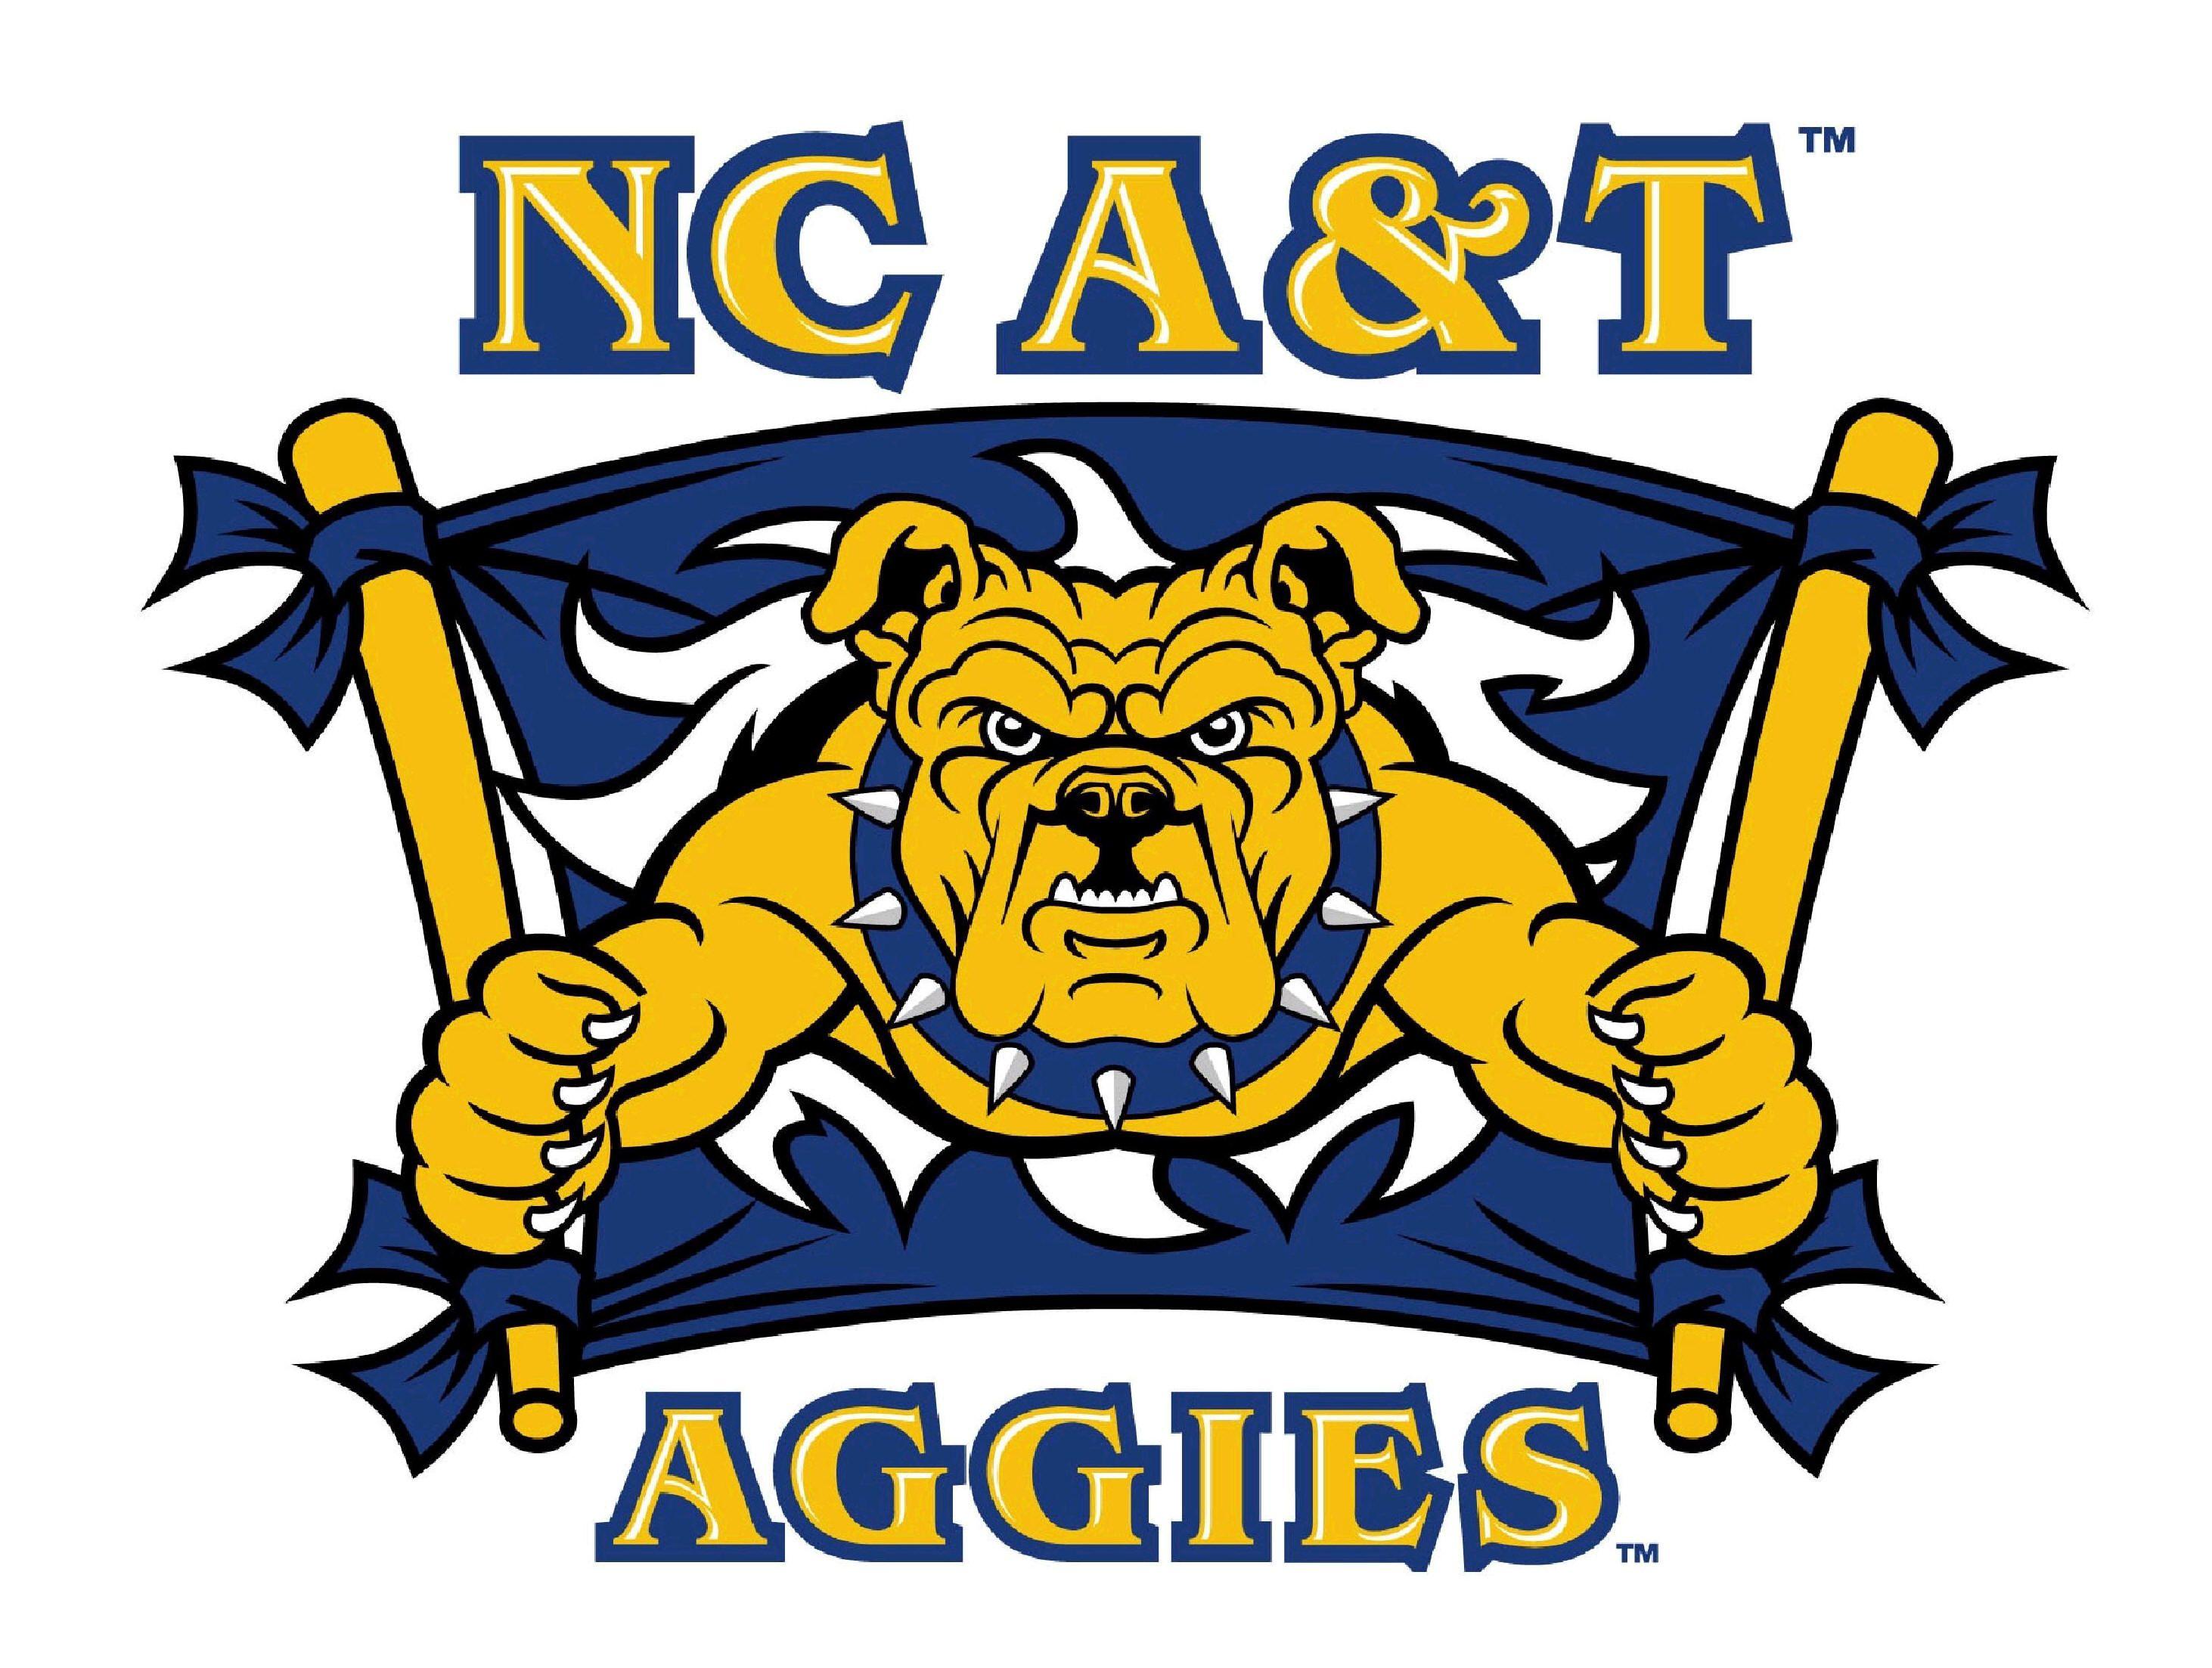 North Carolina A Aggies Greensboro Nc Hbcu Historically